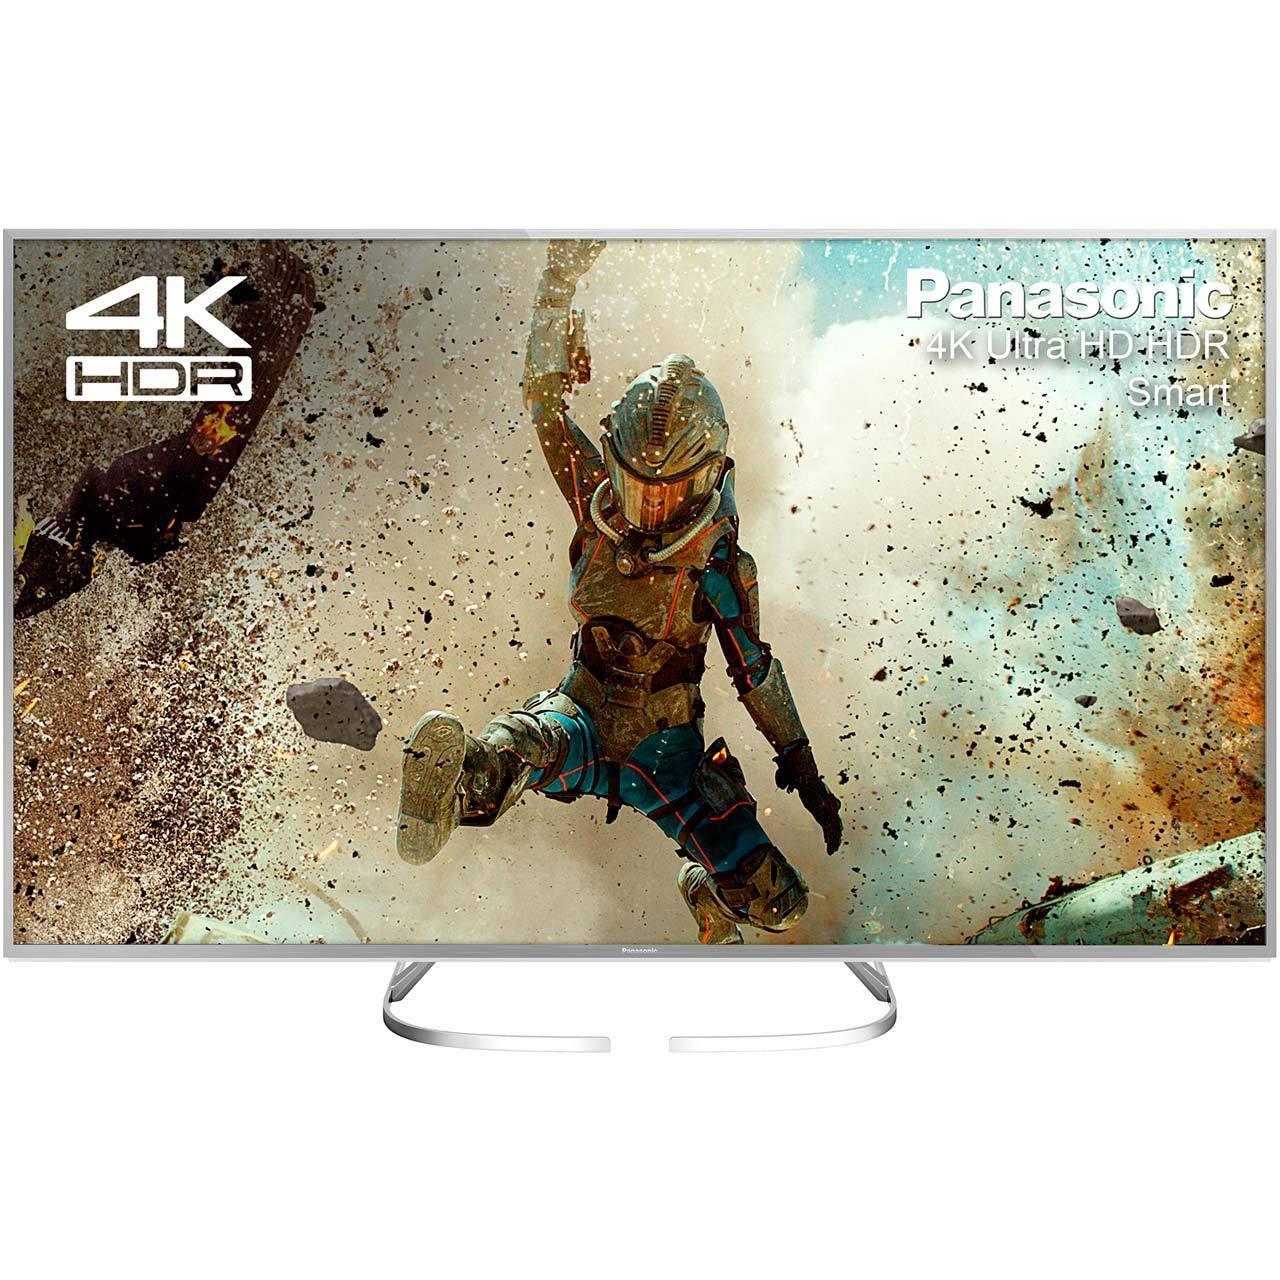 "PANASONIC VIERA TX-50EX700B 50"" Smart 4K Ultra HD HDR LED TV - £639 (After Voucher) @ PCWorld"